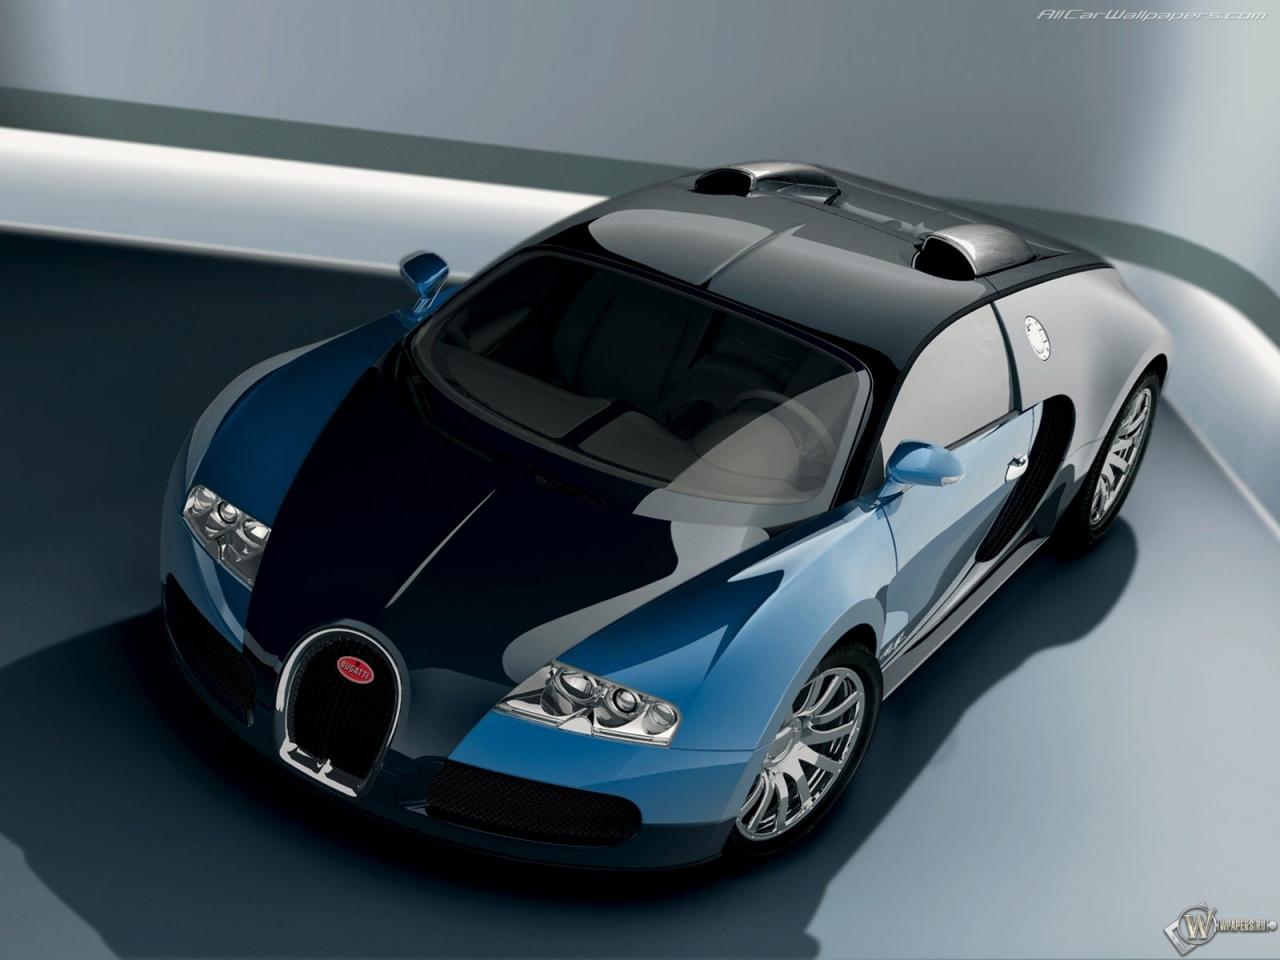 bugatti veyron bugatti veyron 1280 960 4 3. Black Bedroom Furniture Sets. Home Design Ideas